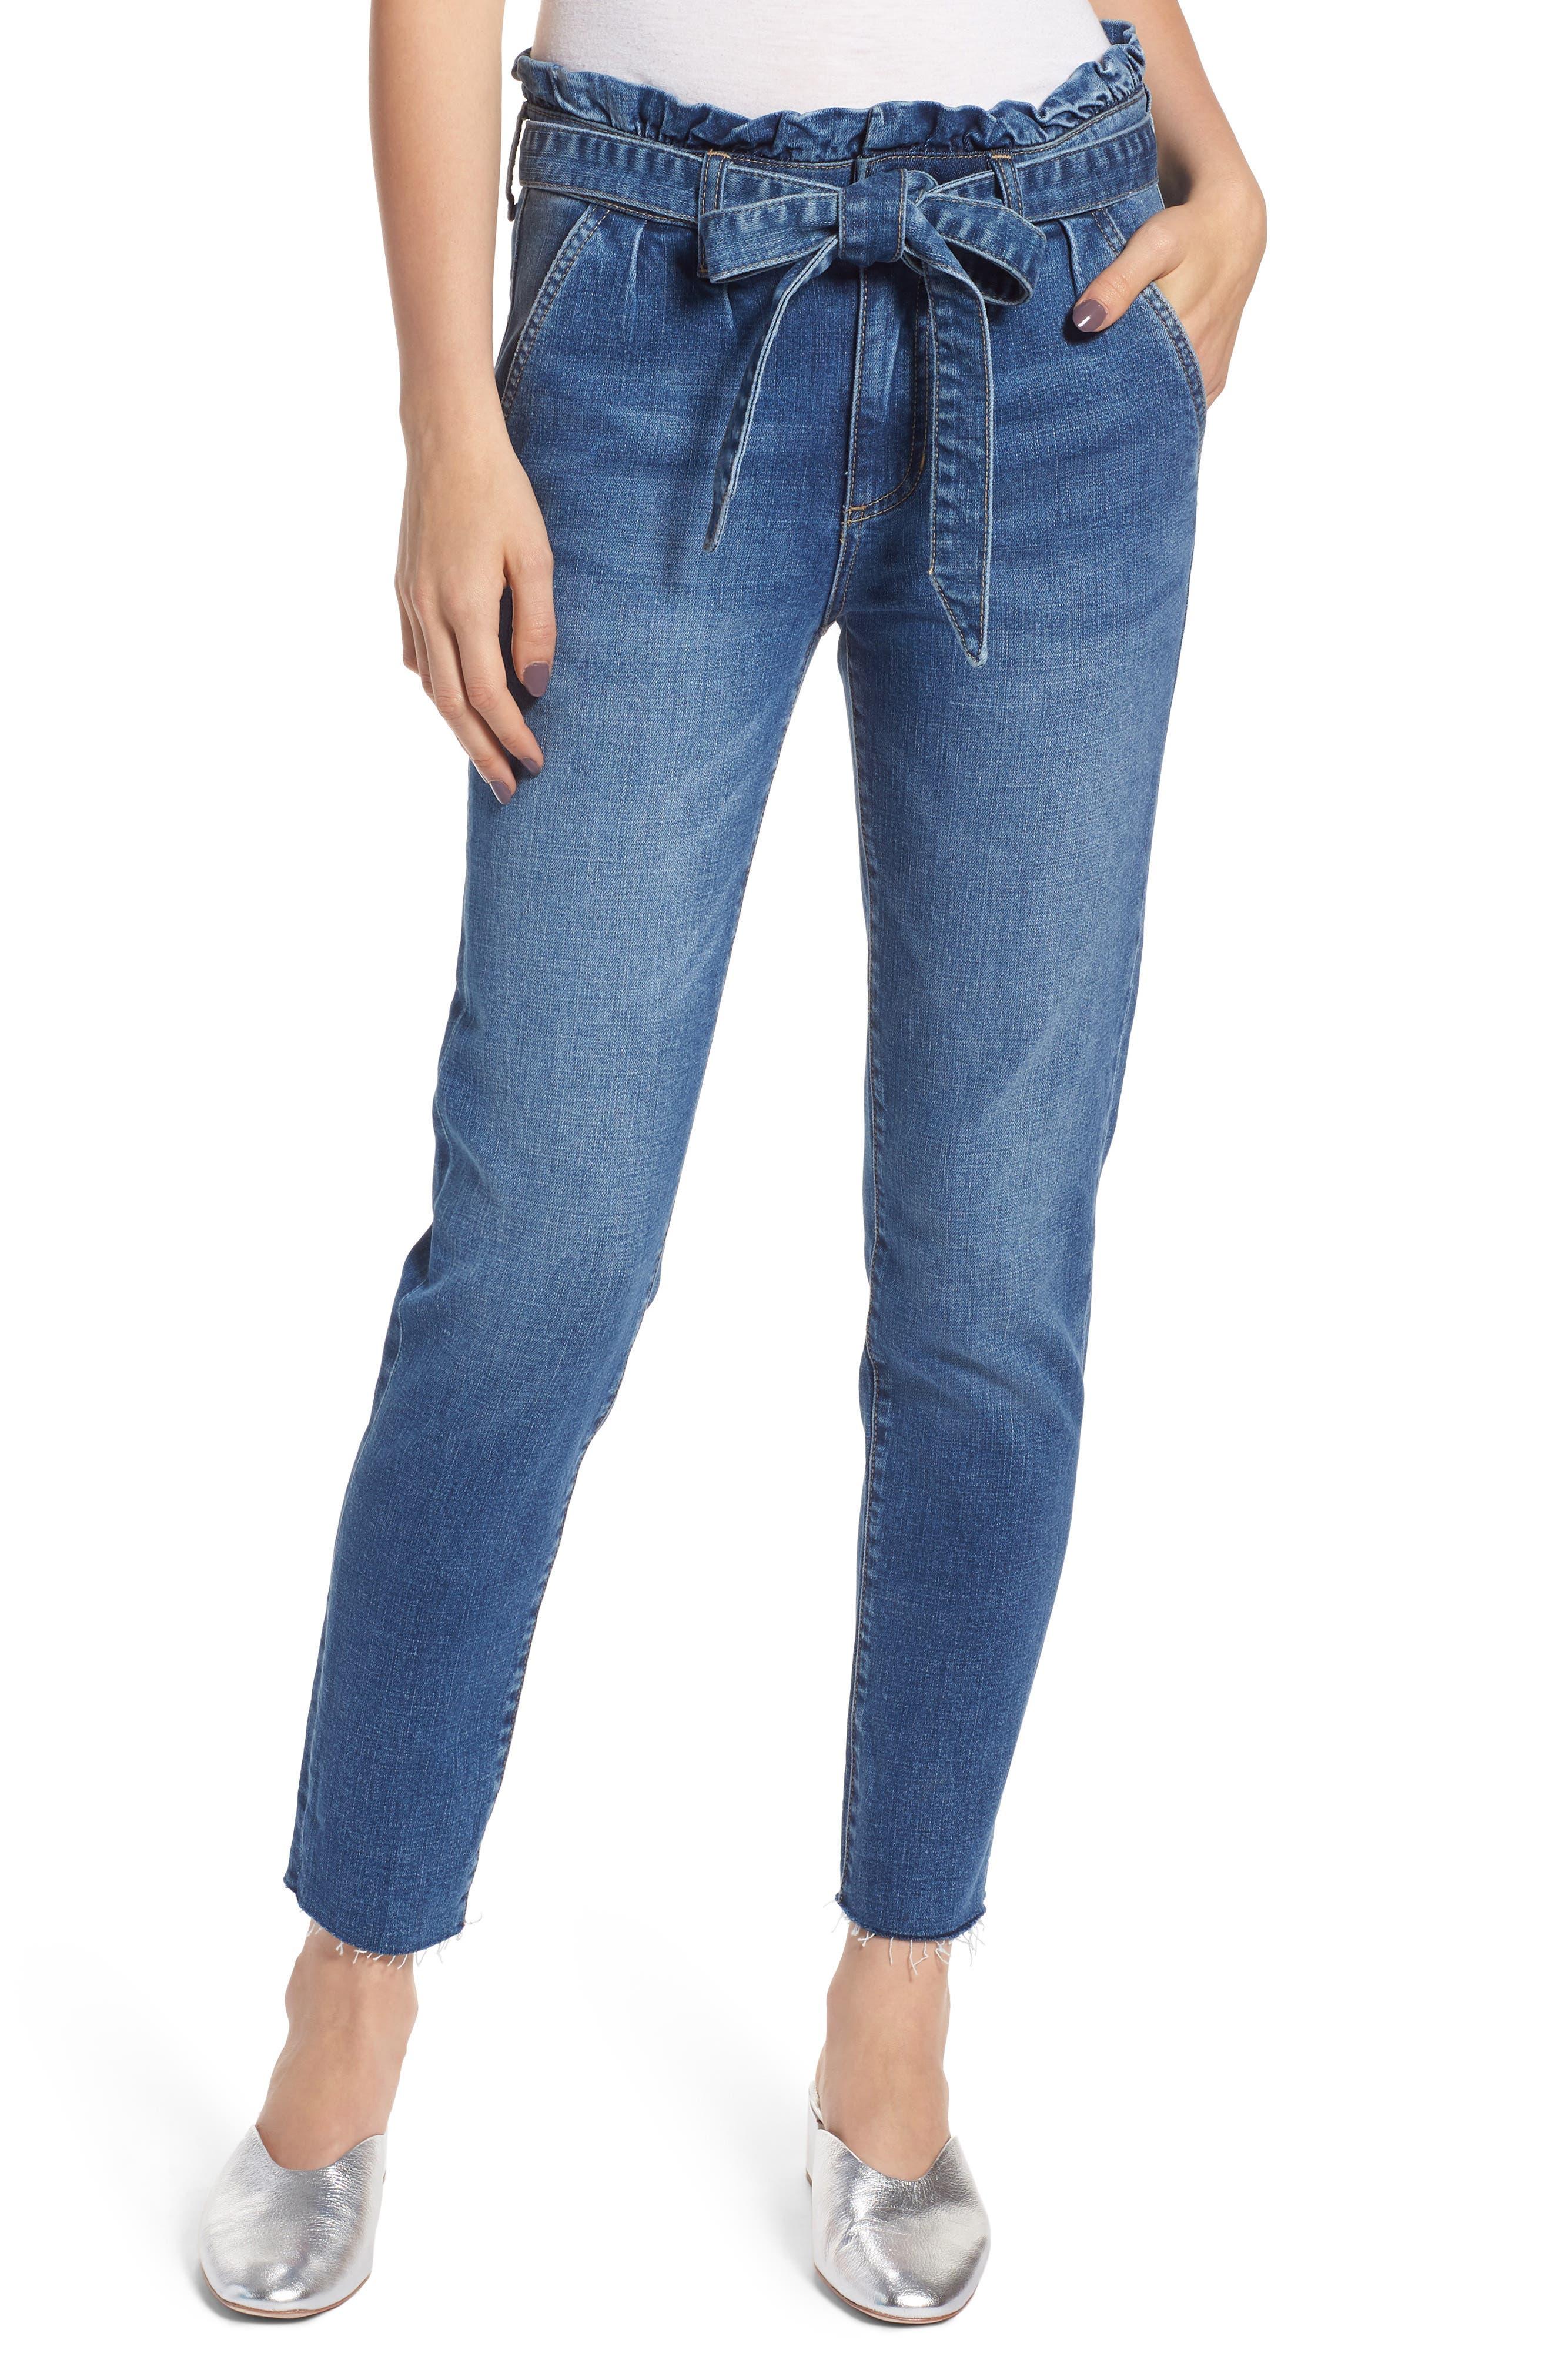 PROSPERITY DENIM, Paperbag Waist Skinny Jeans, Main thumbnail 1, color, PRETTY